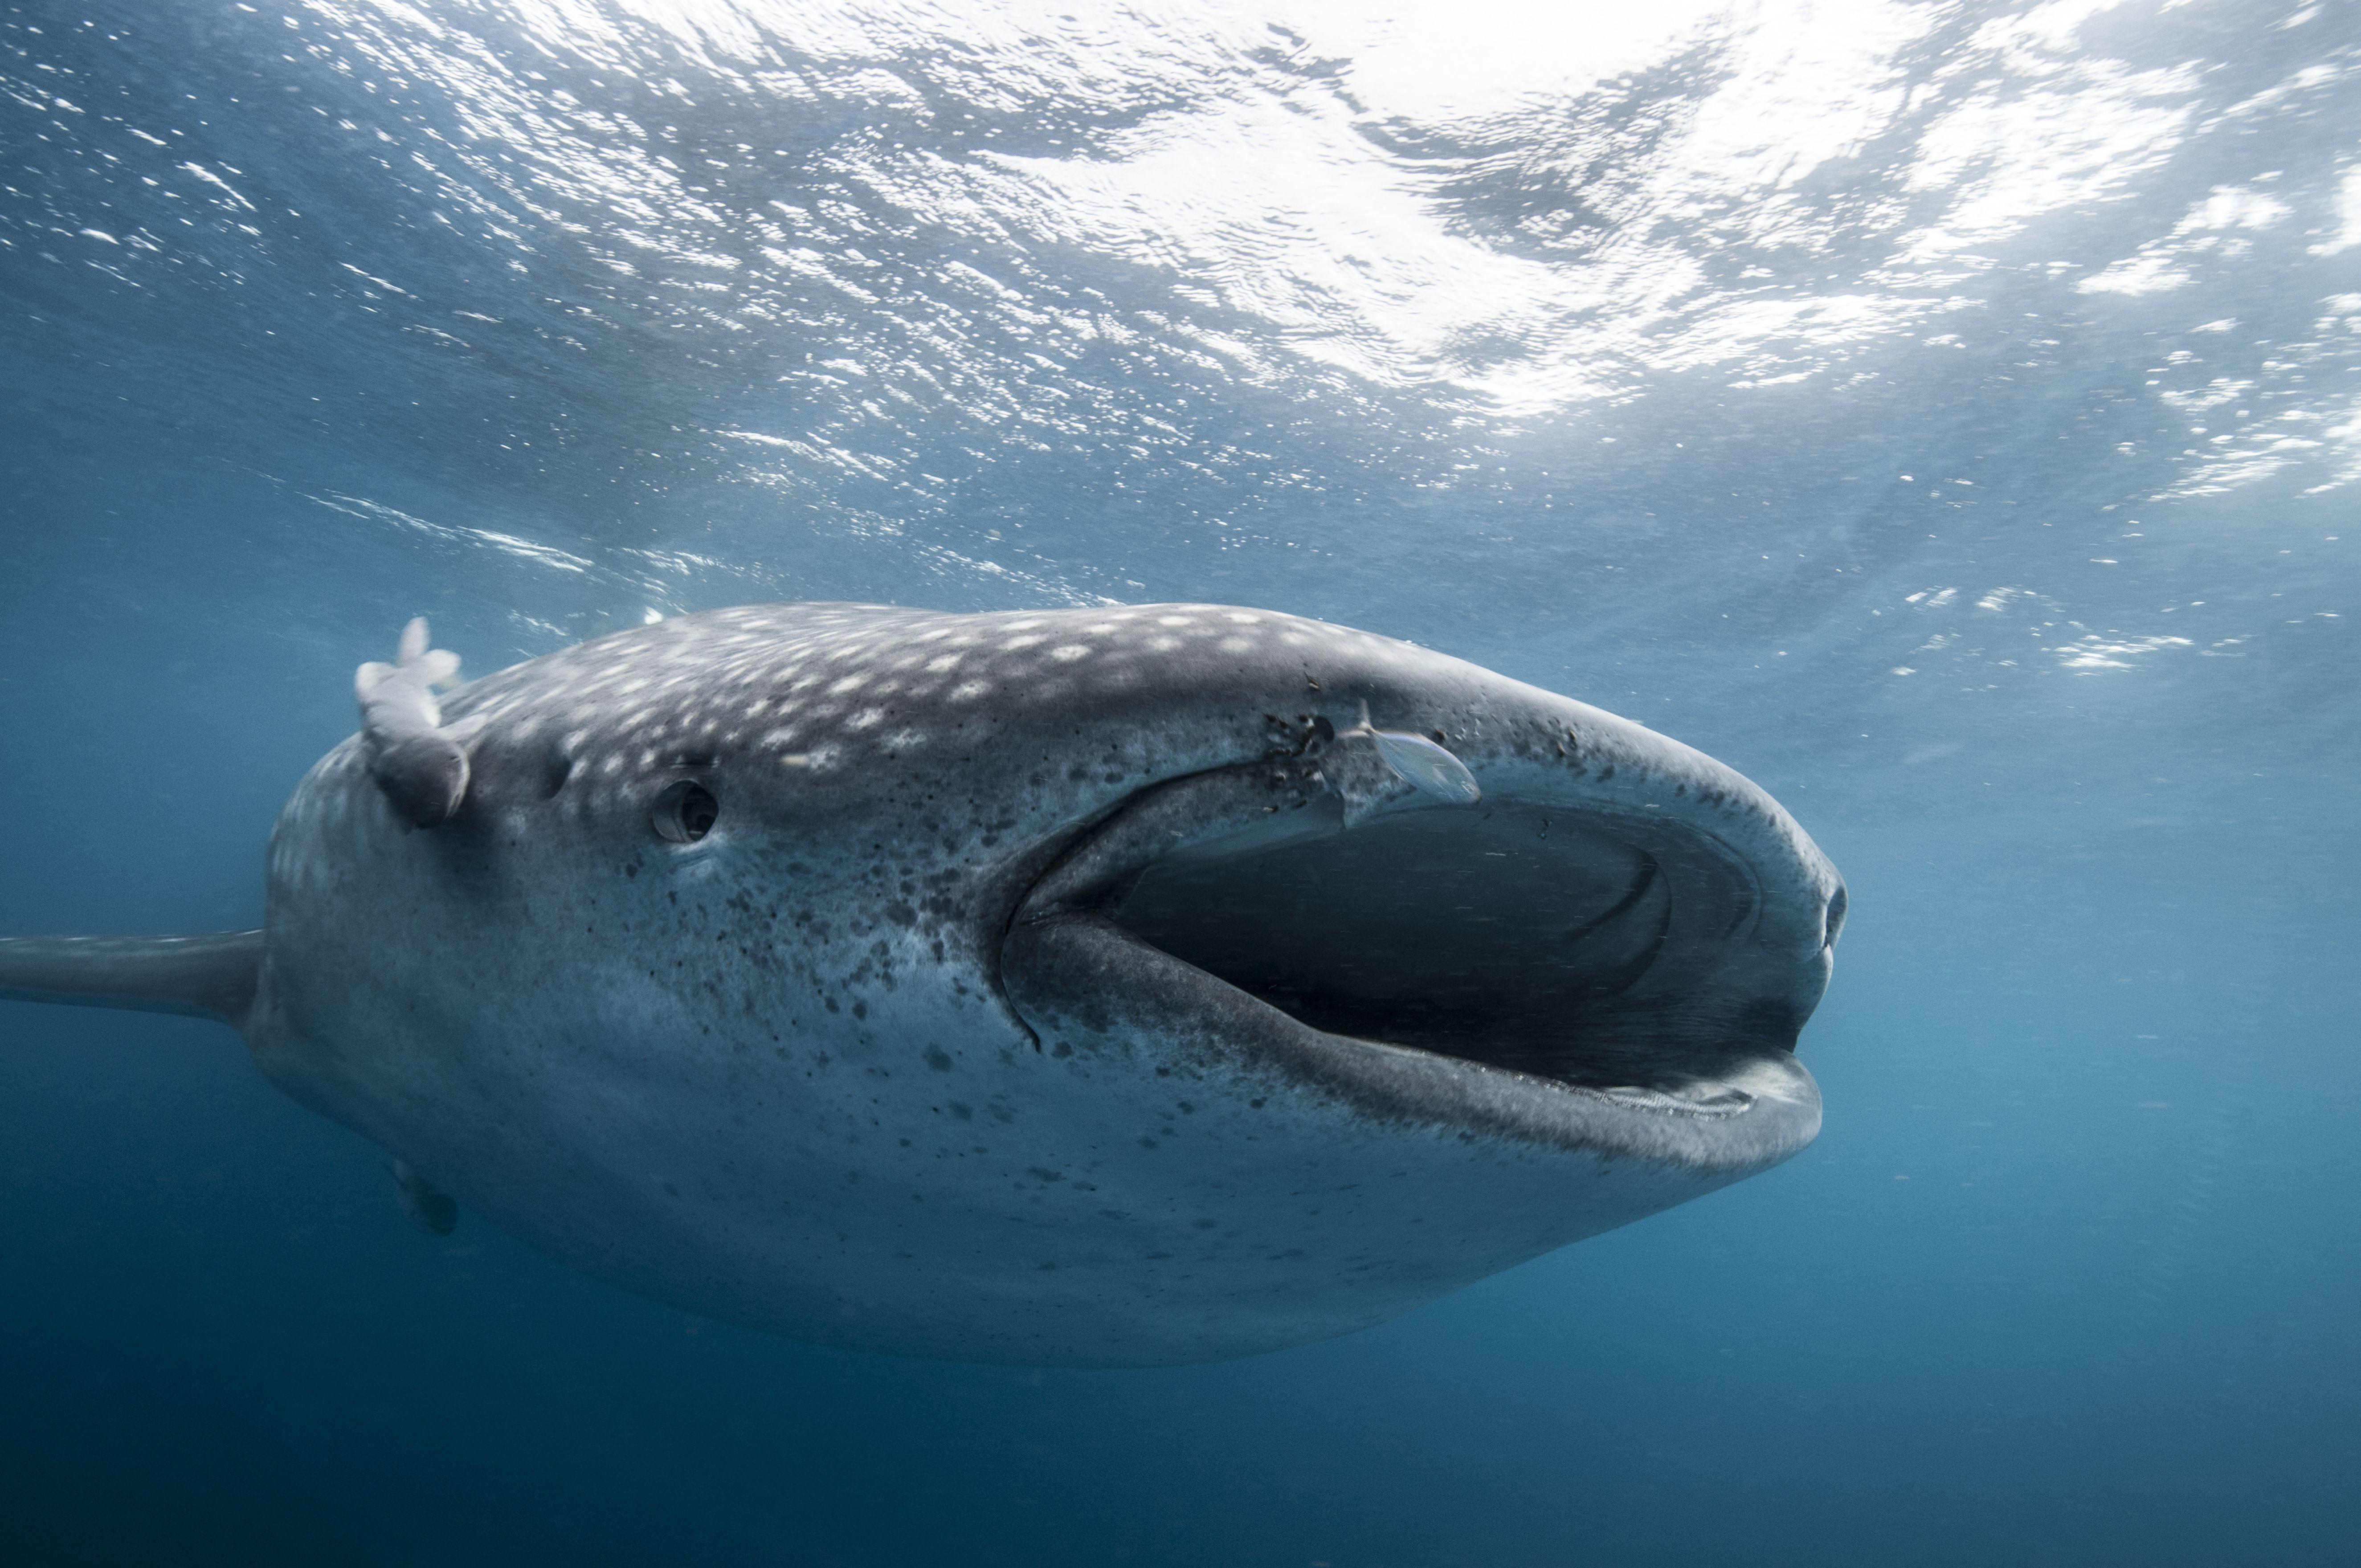 Whale shark feeding in Mexico